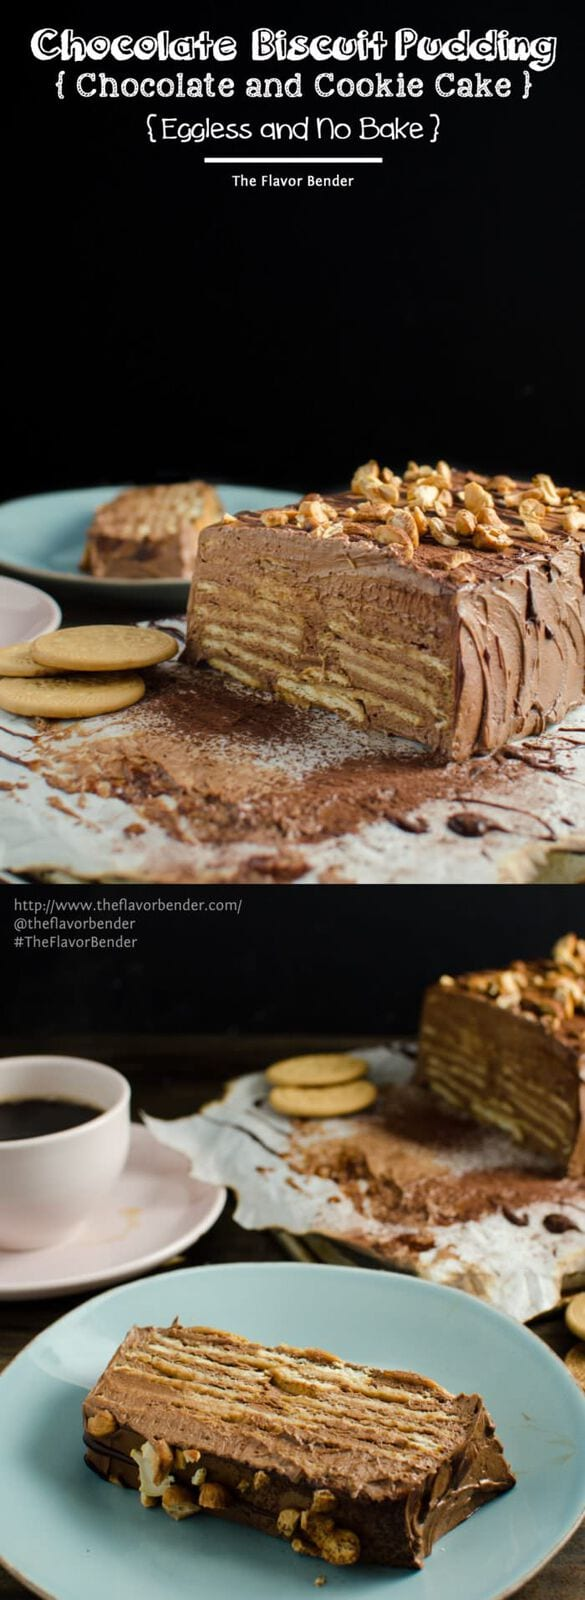 Sri Lankan Chocolate Cake Recipe Video